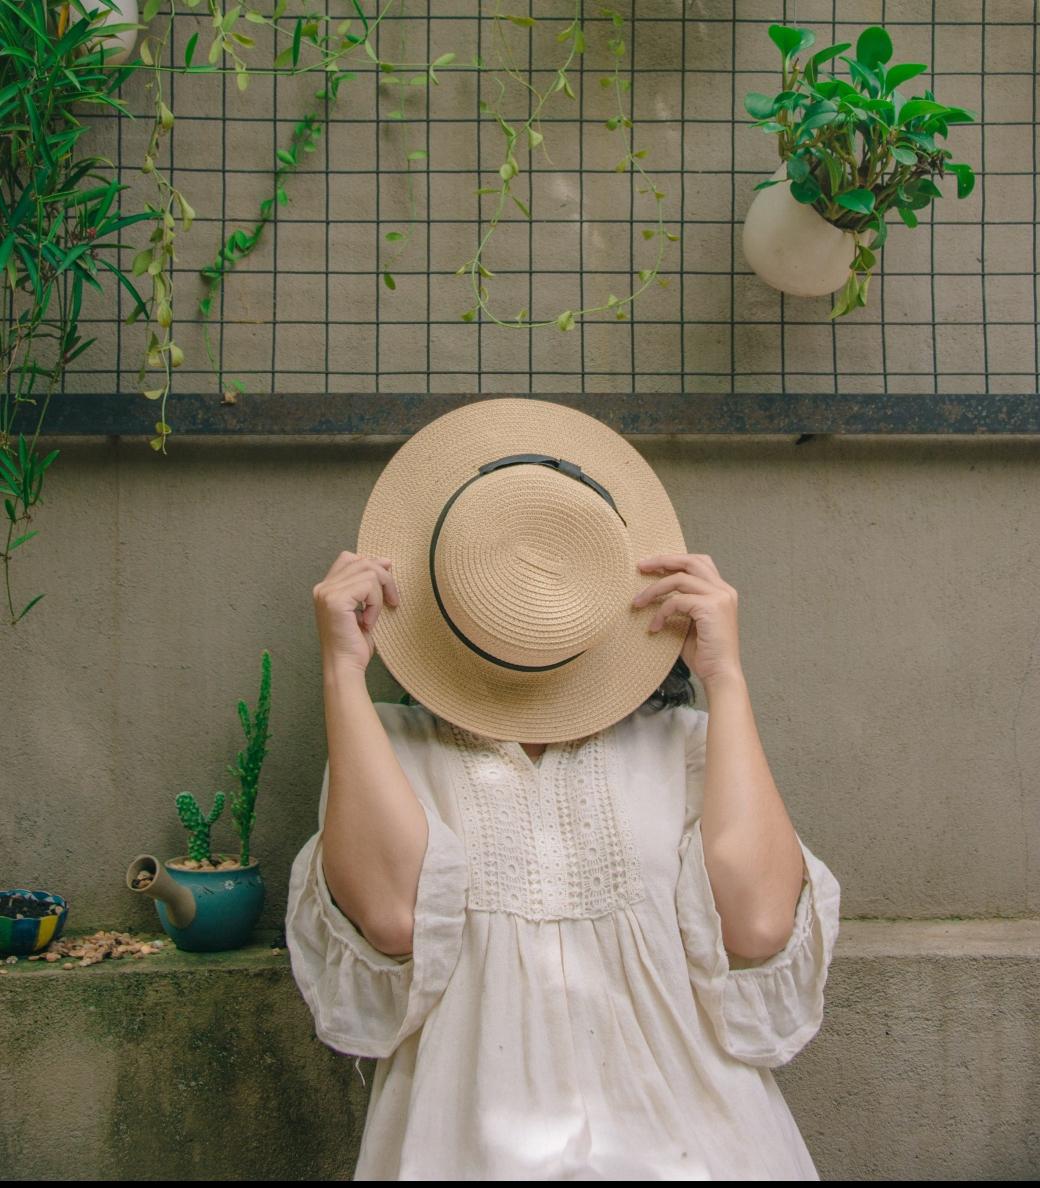 daytime-funny-garden-1076583